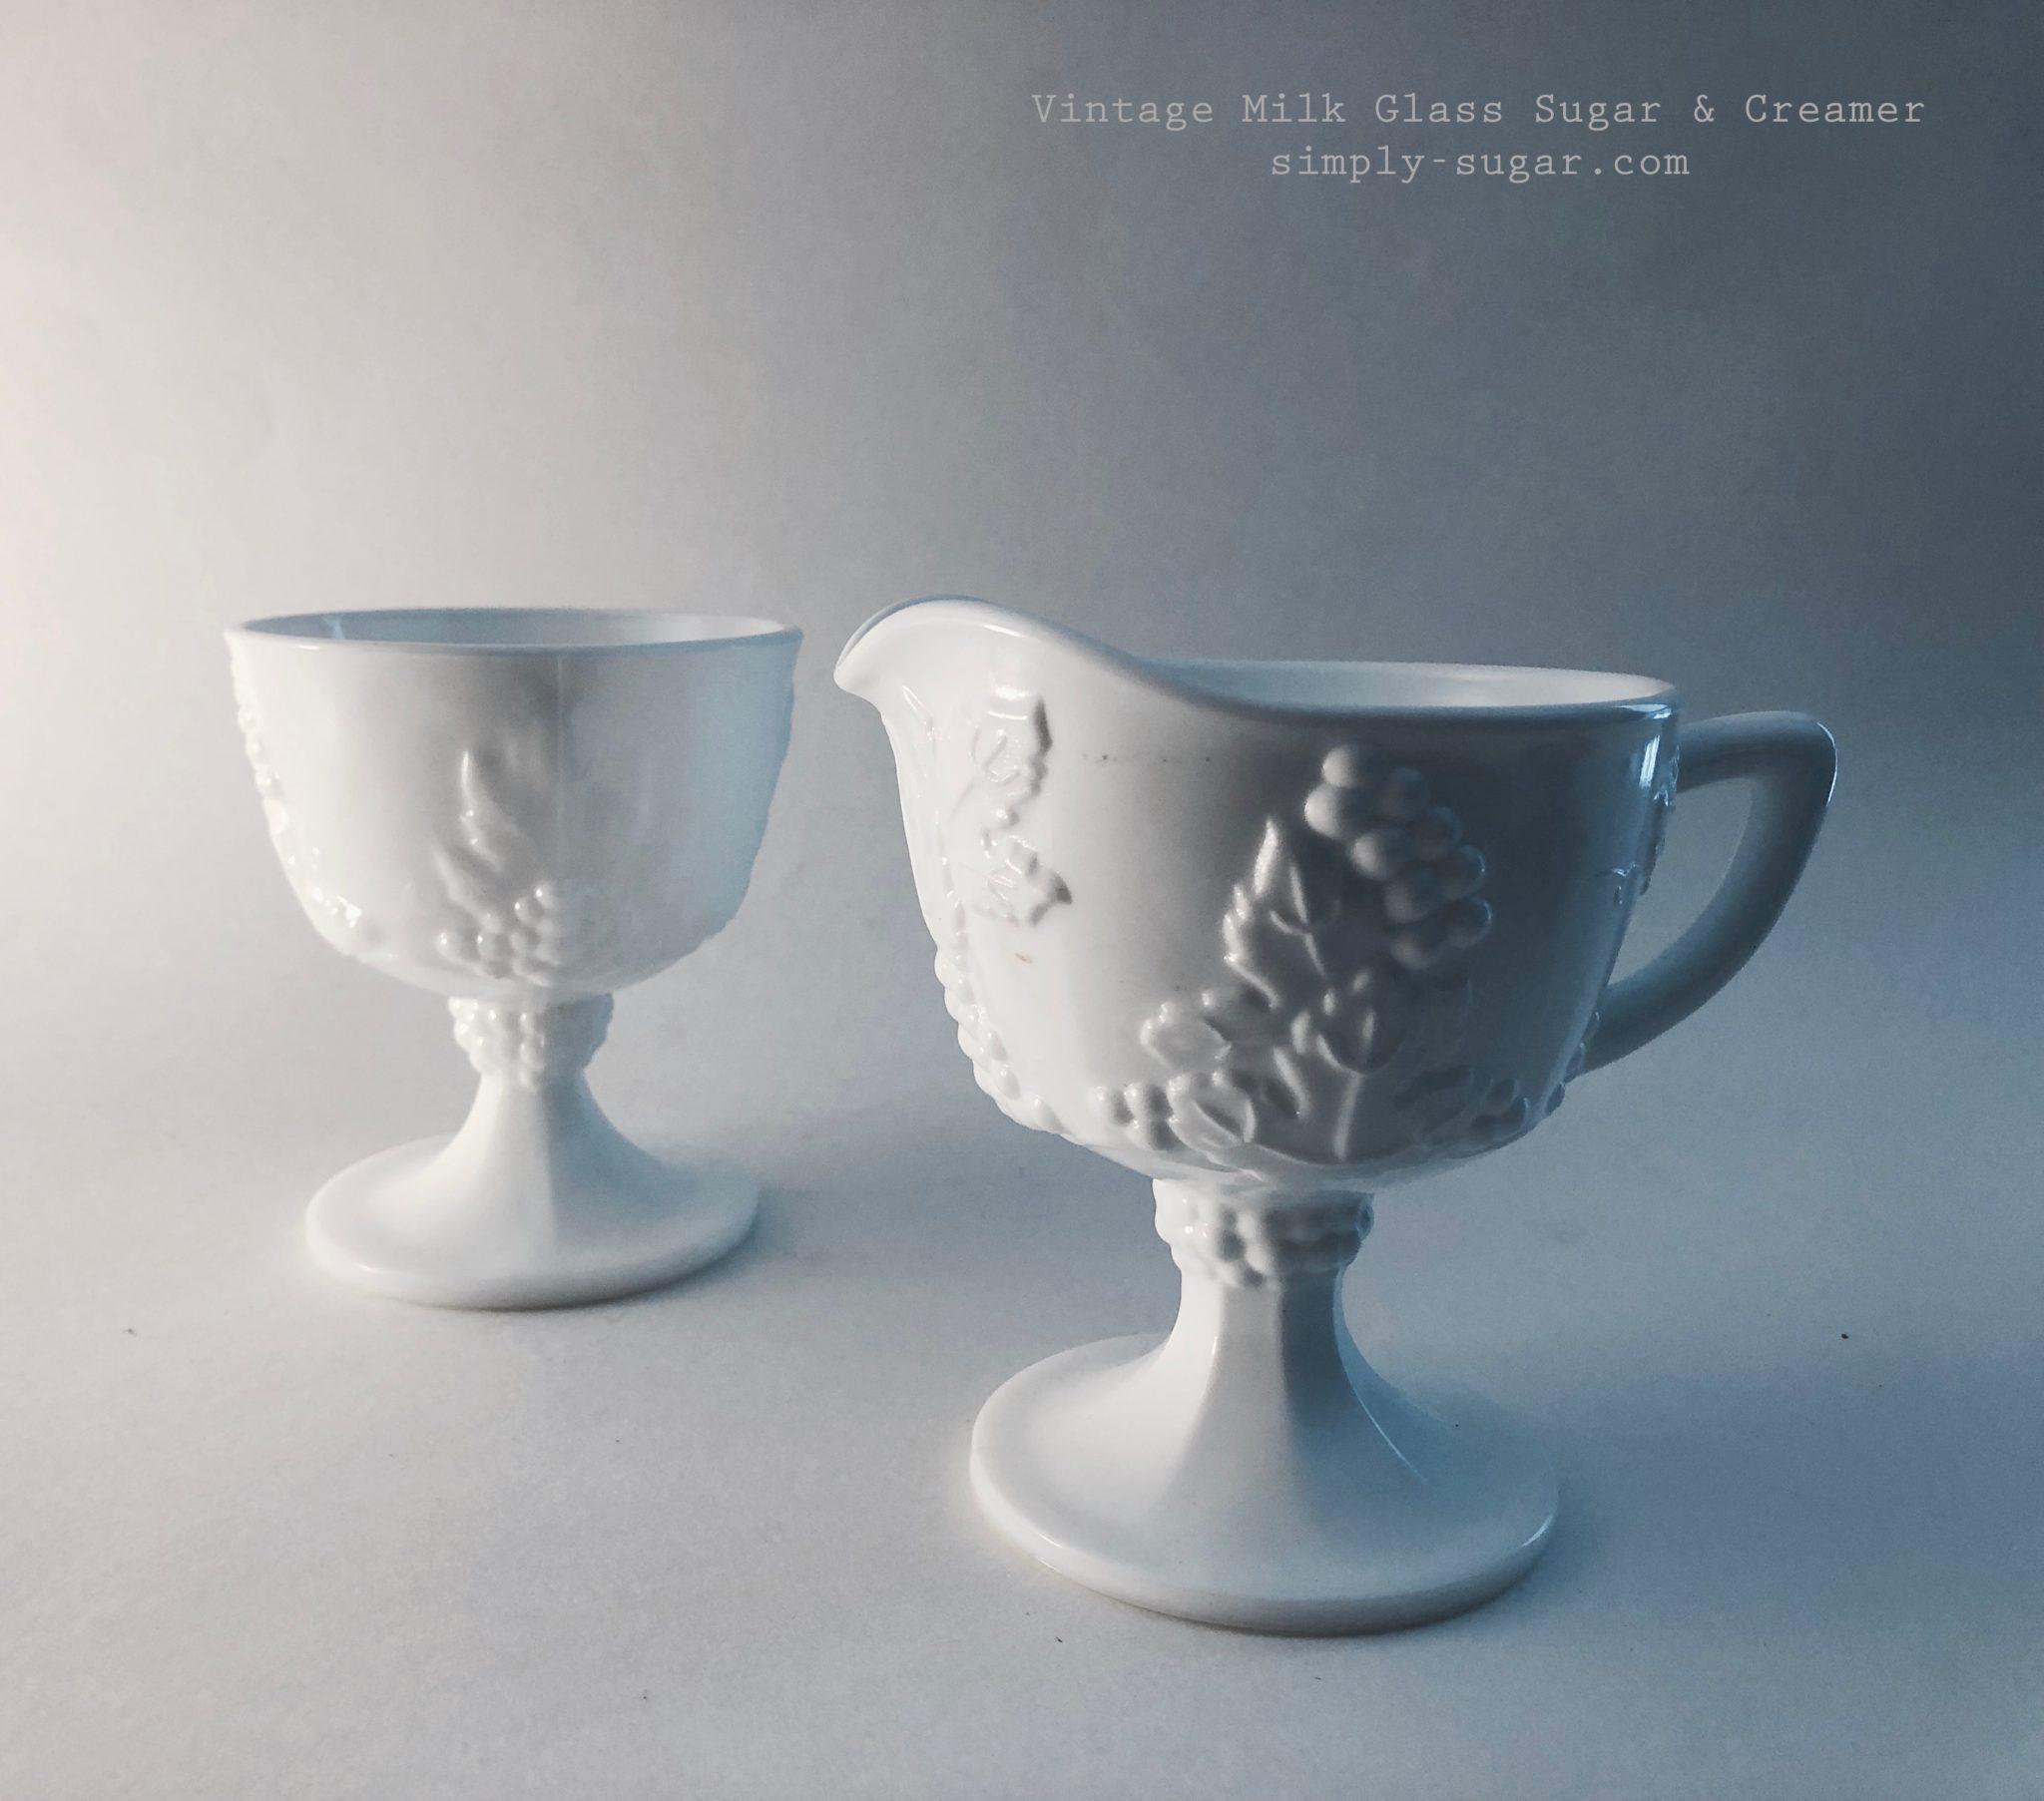 Milk Glass Sugar & Creamer